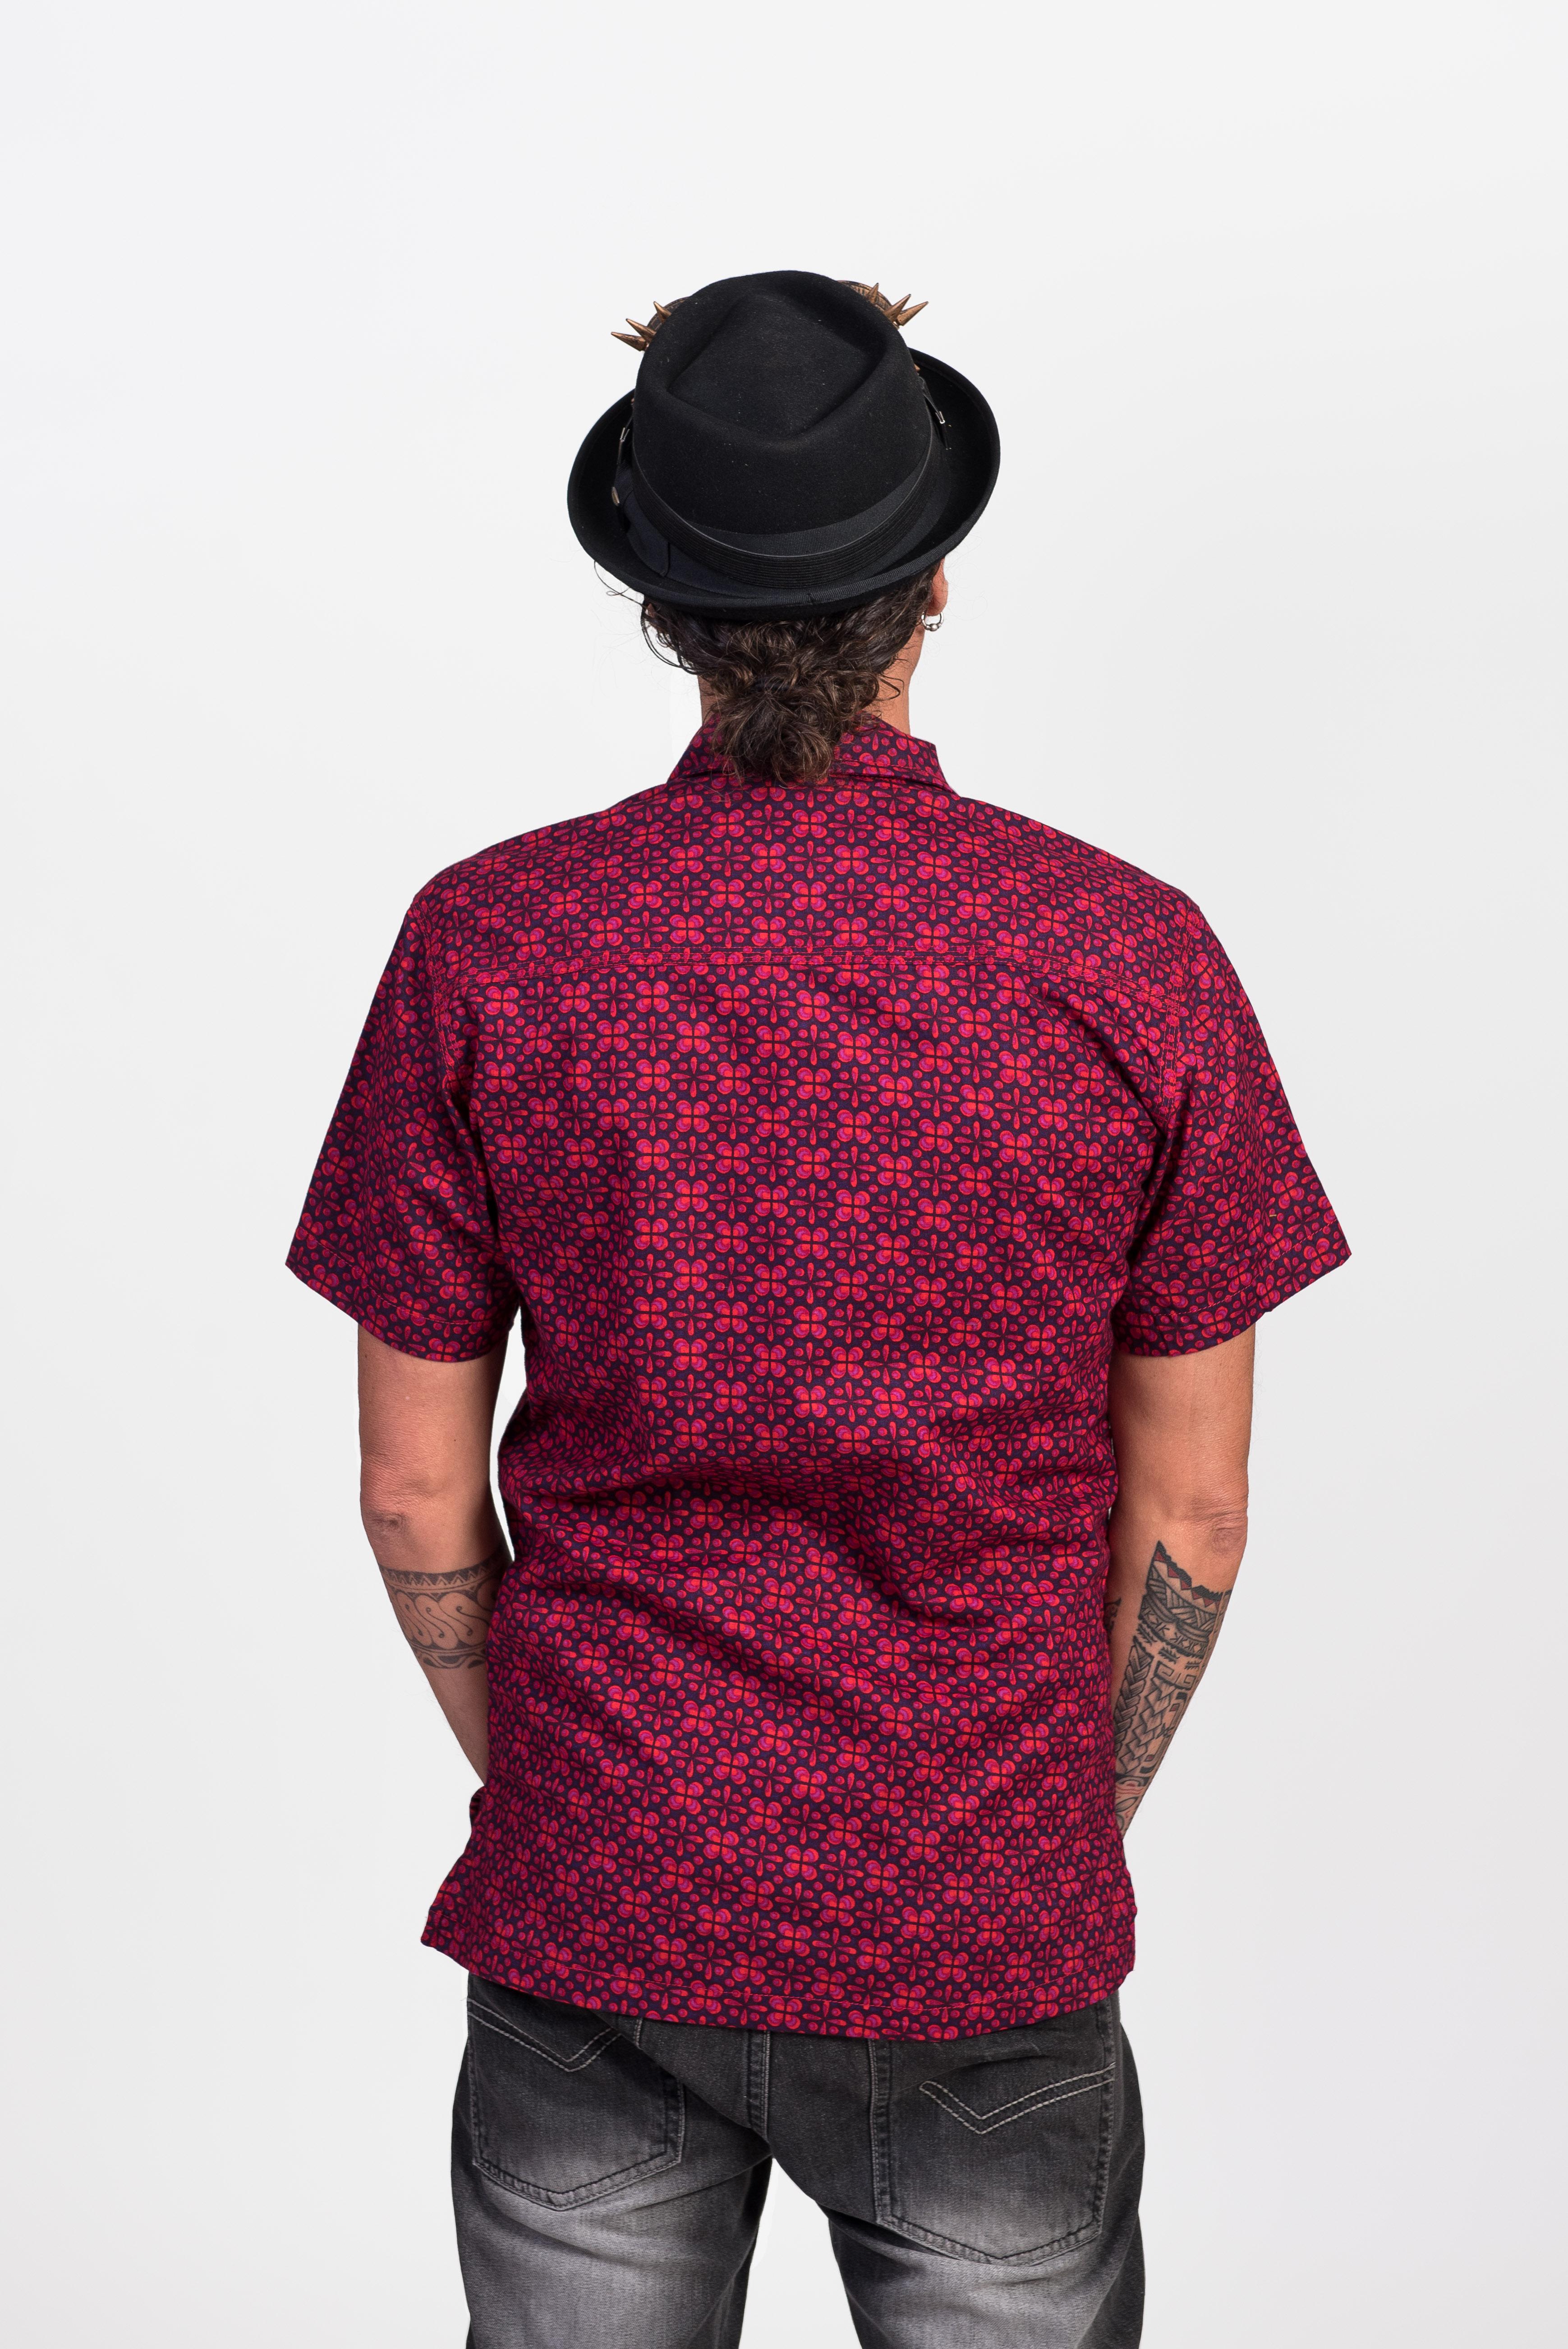 Men's Shirt - Geo Flower Purple